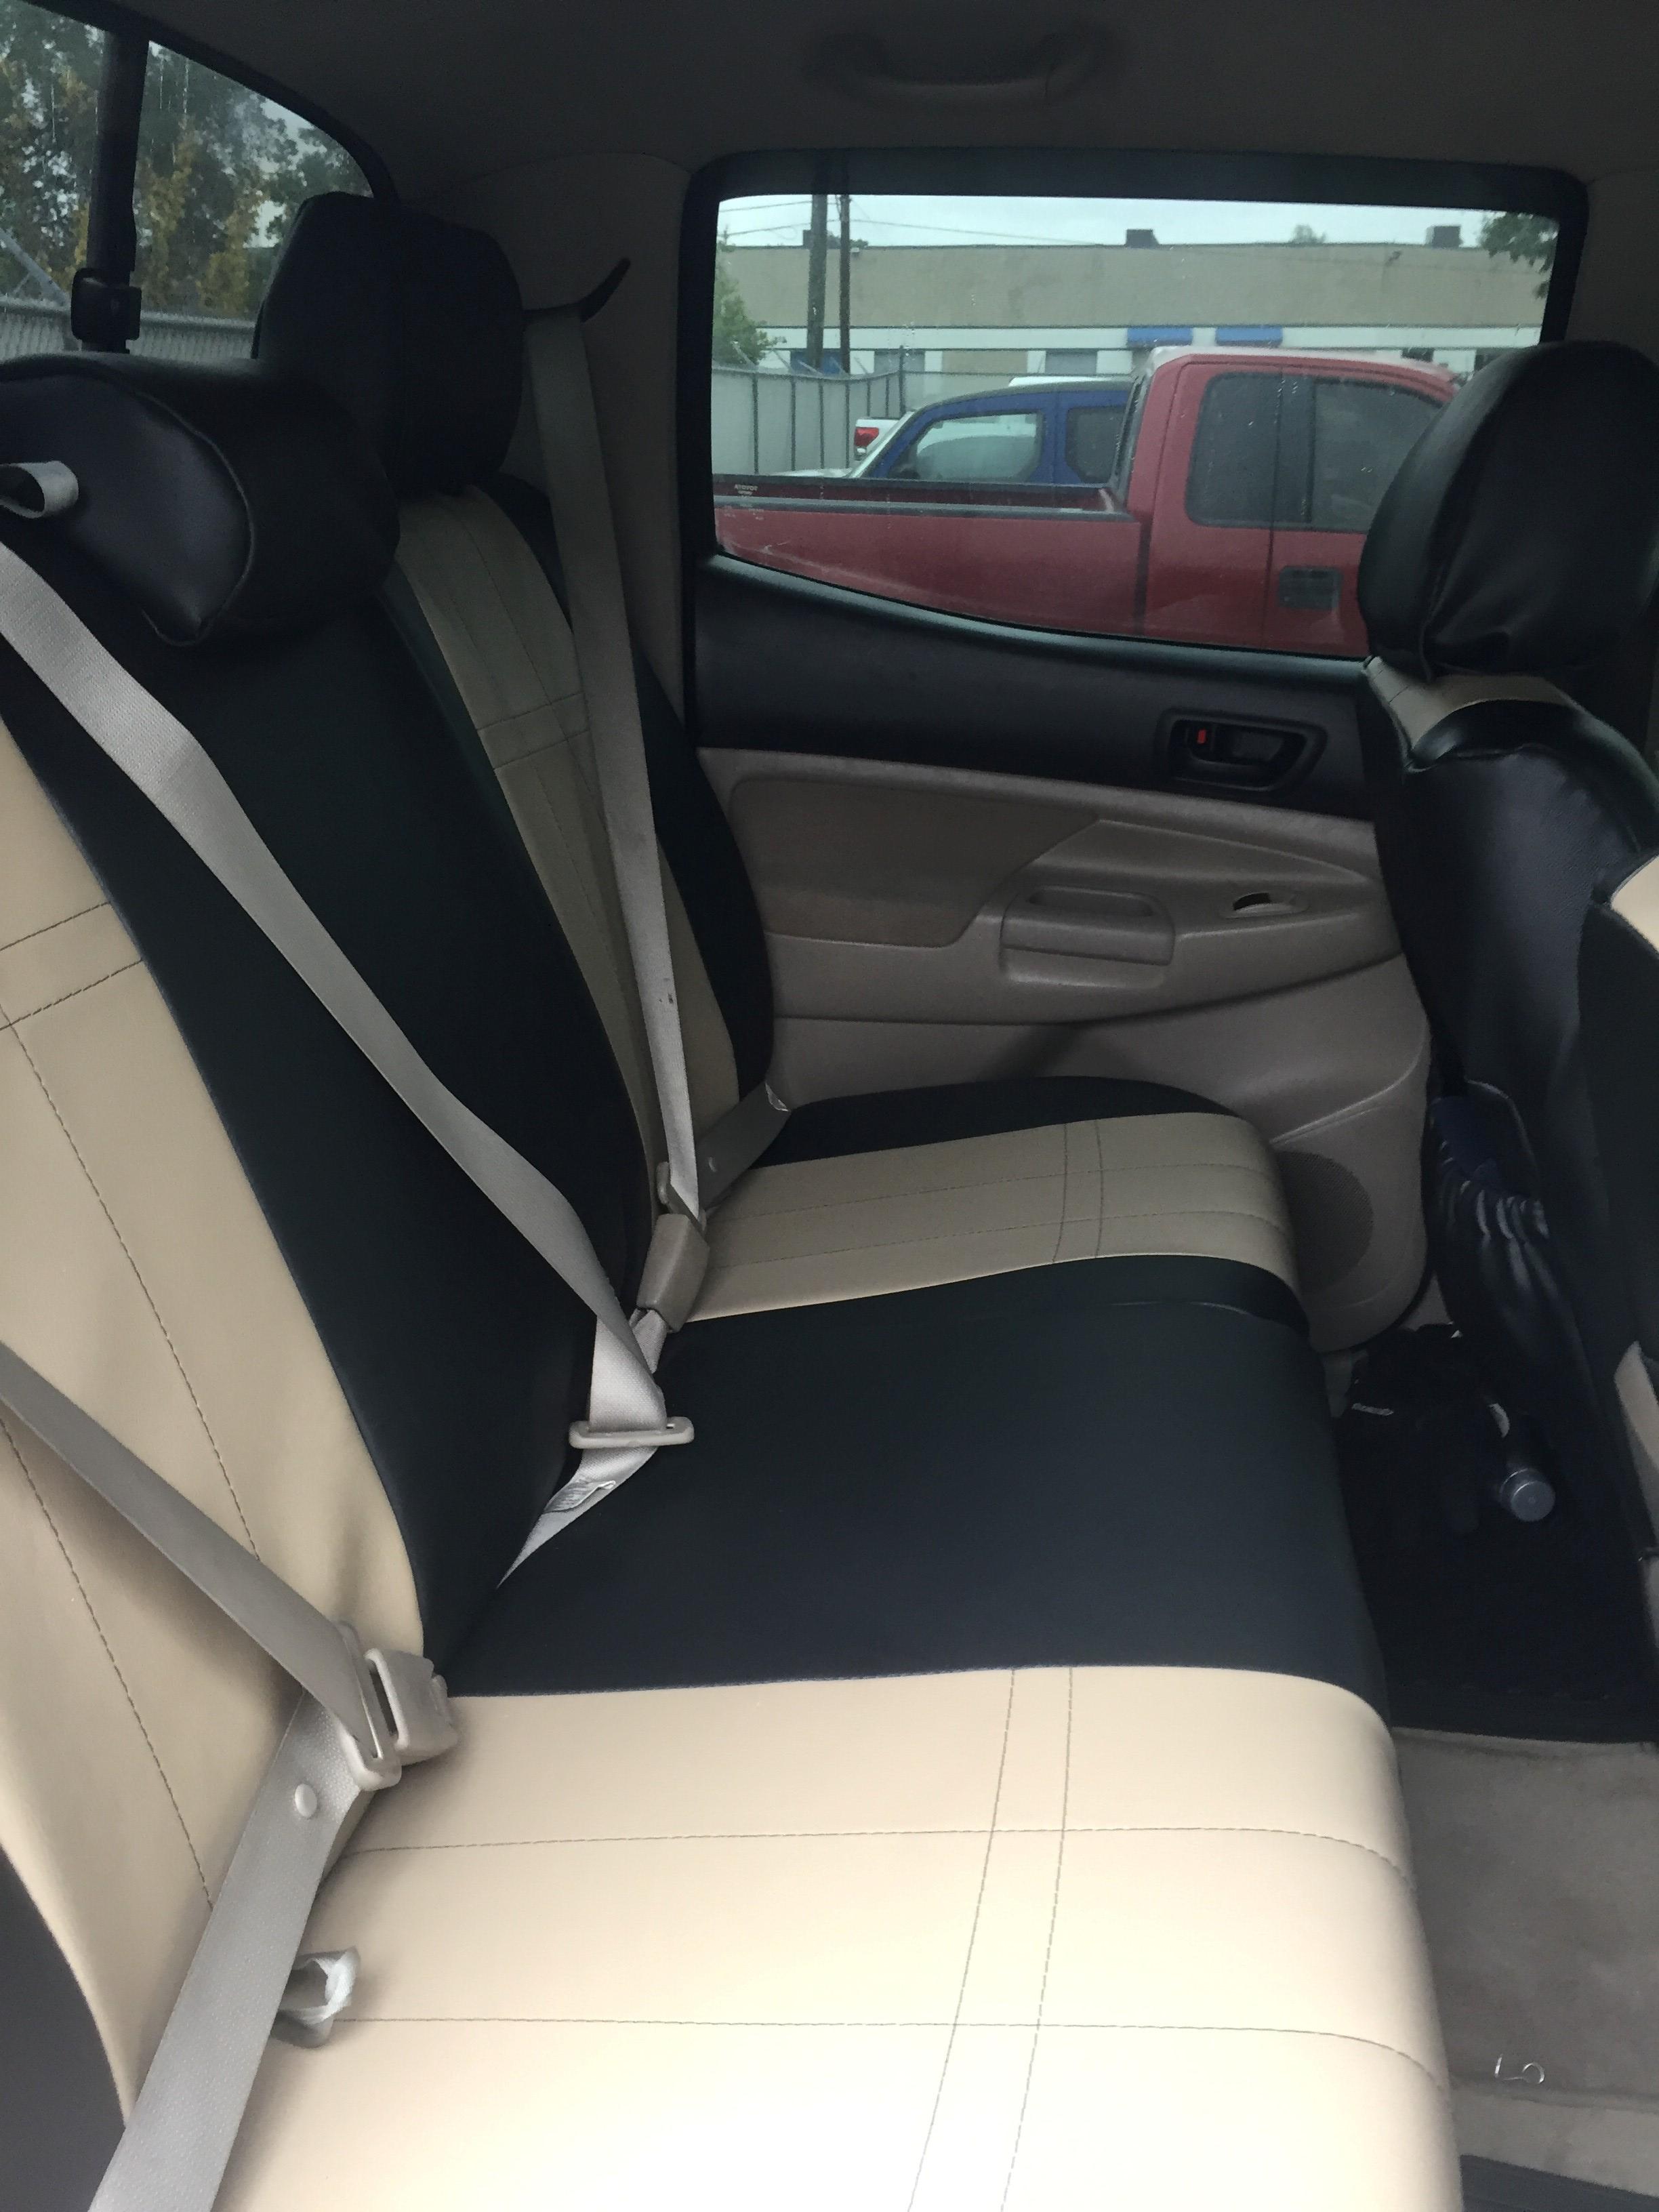 Phenomenal Imitation Leather Seat Covers Machost Co Dining Chair Design Ideas Machostcouk